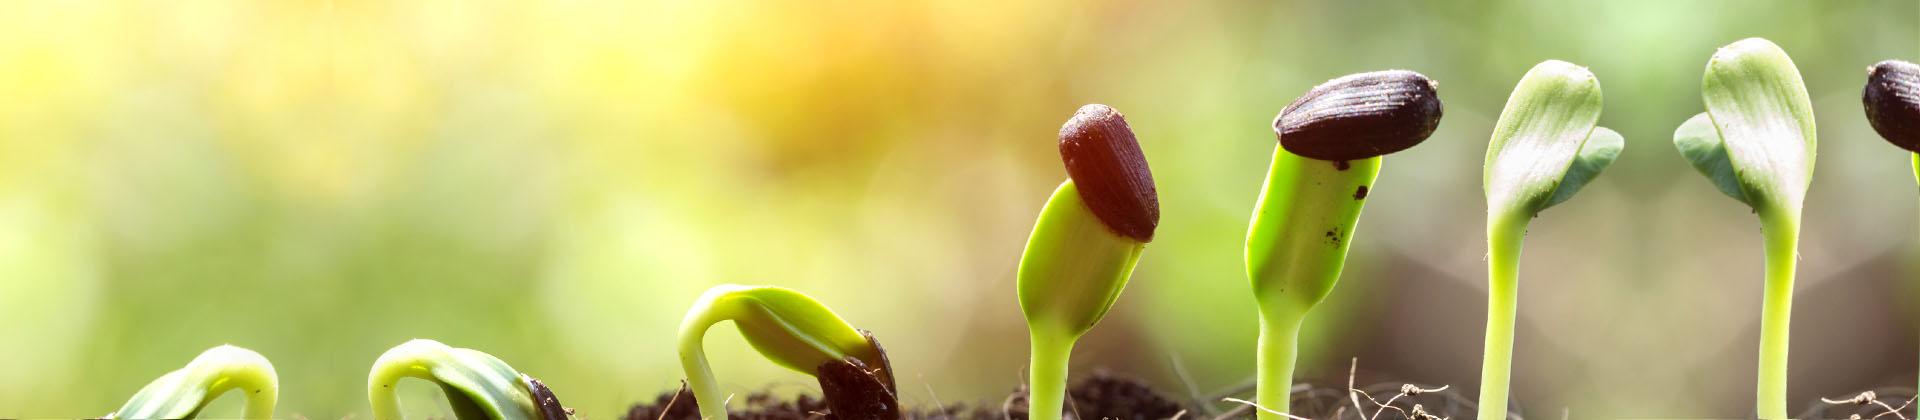 nasiona roślin